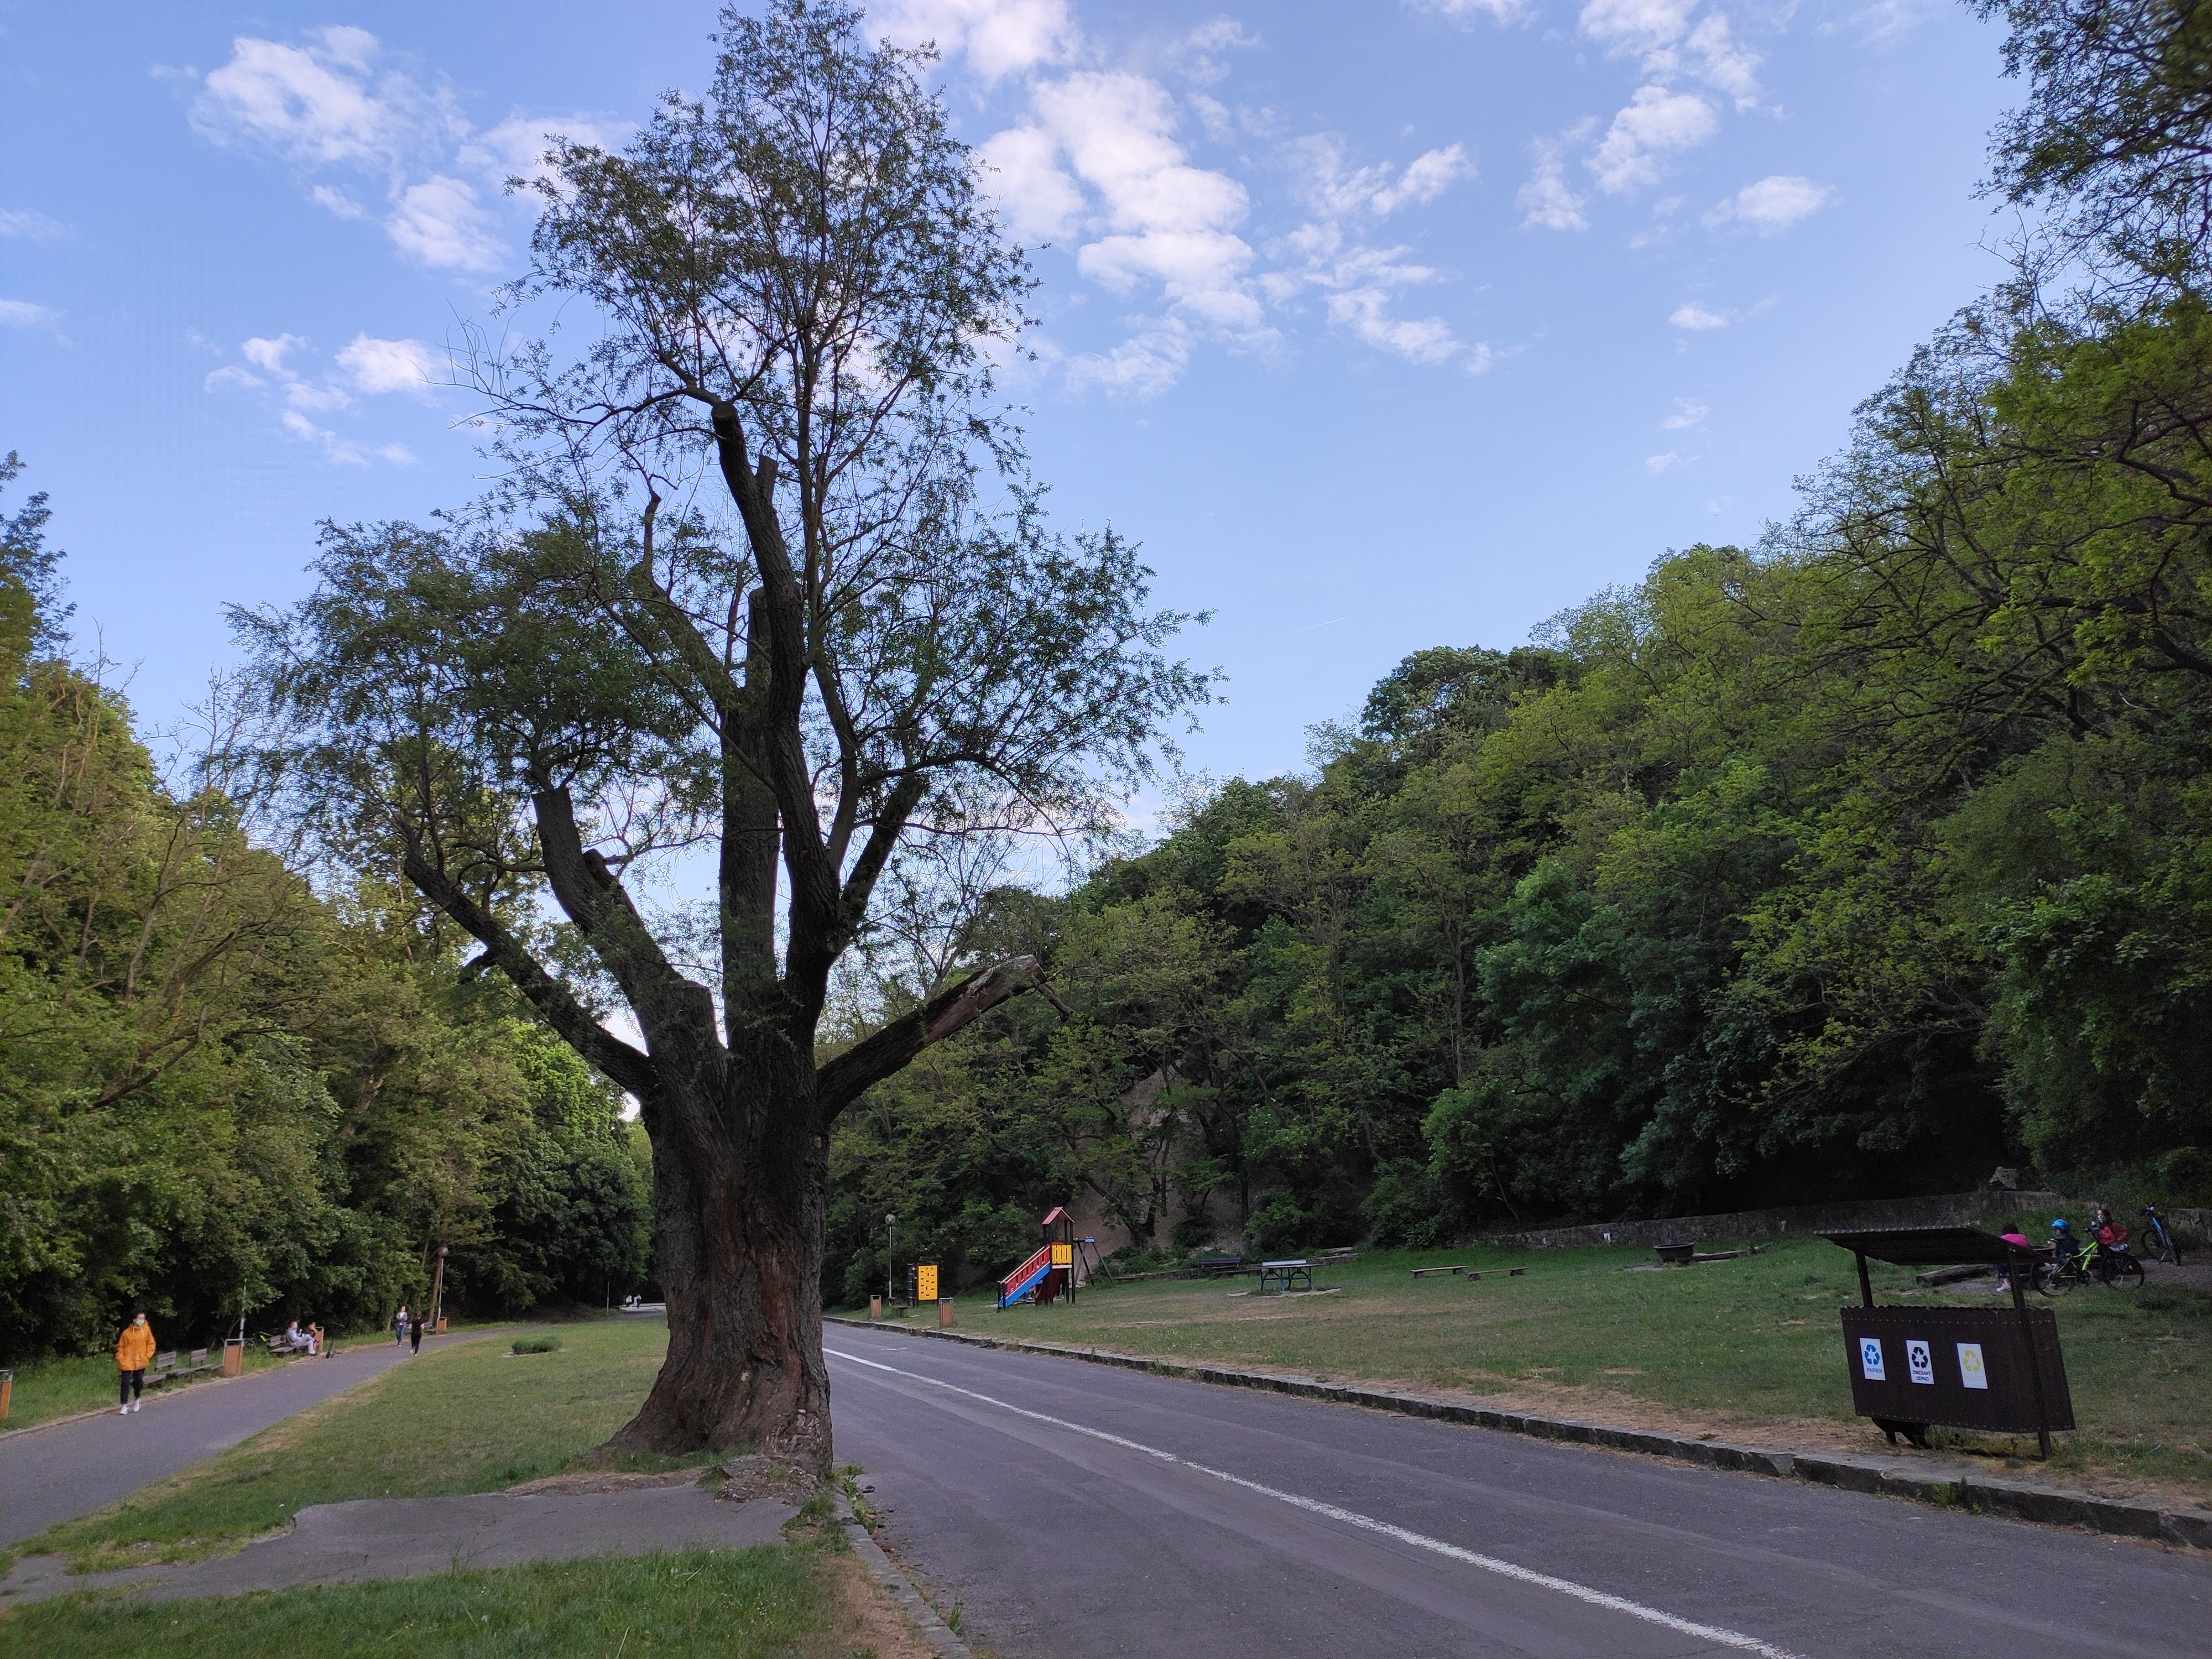 Park SNP Karlova VEs1